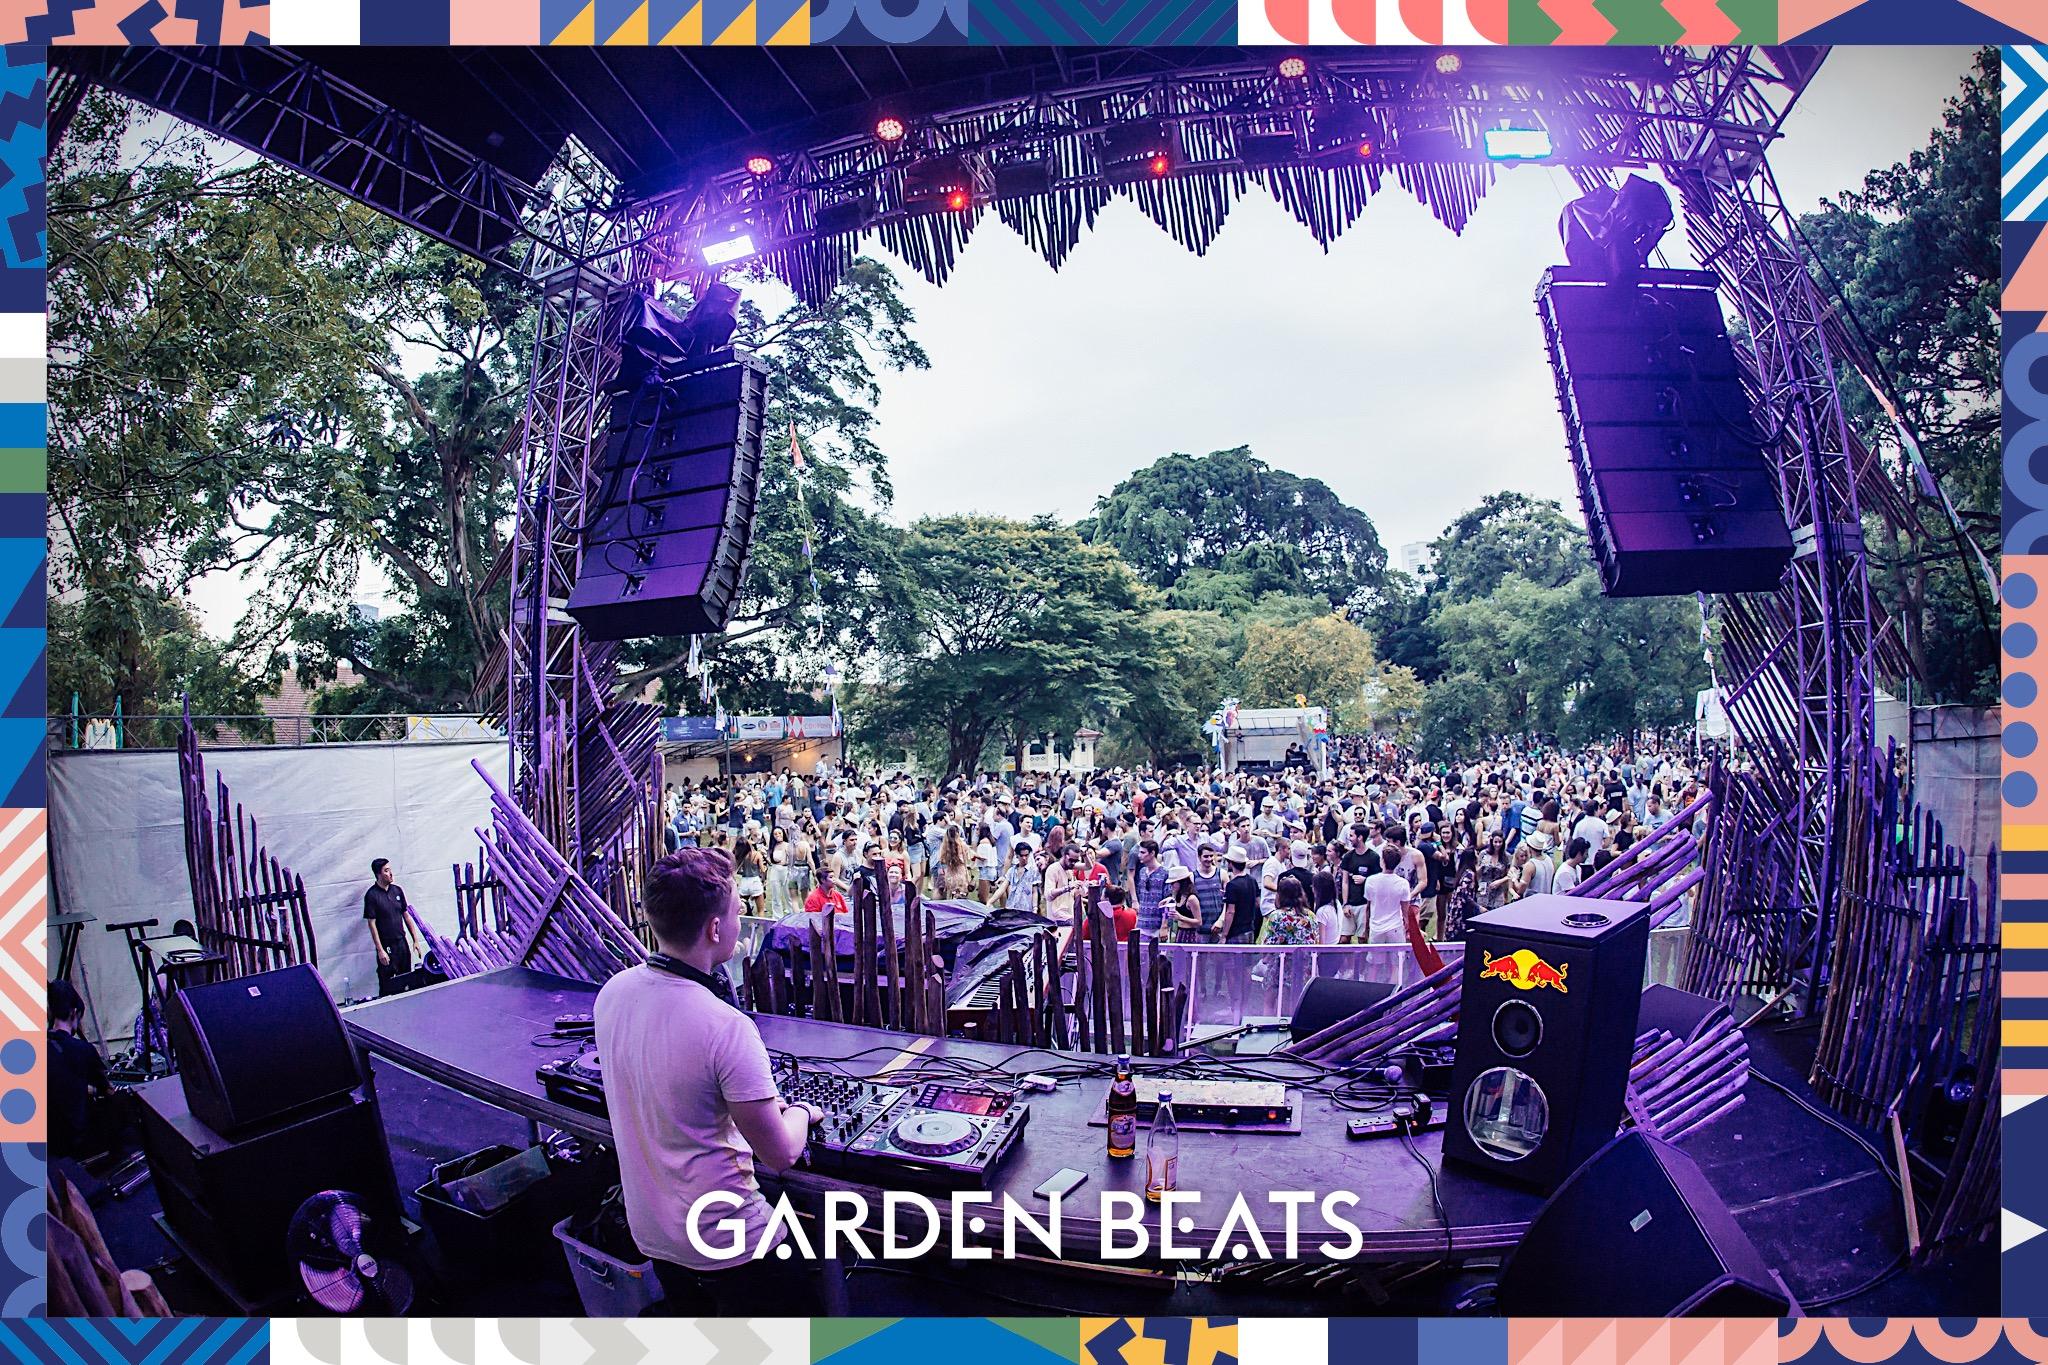 18032017_GardenBeats_Colossal604_WatermarkedGB.jpg